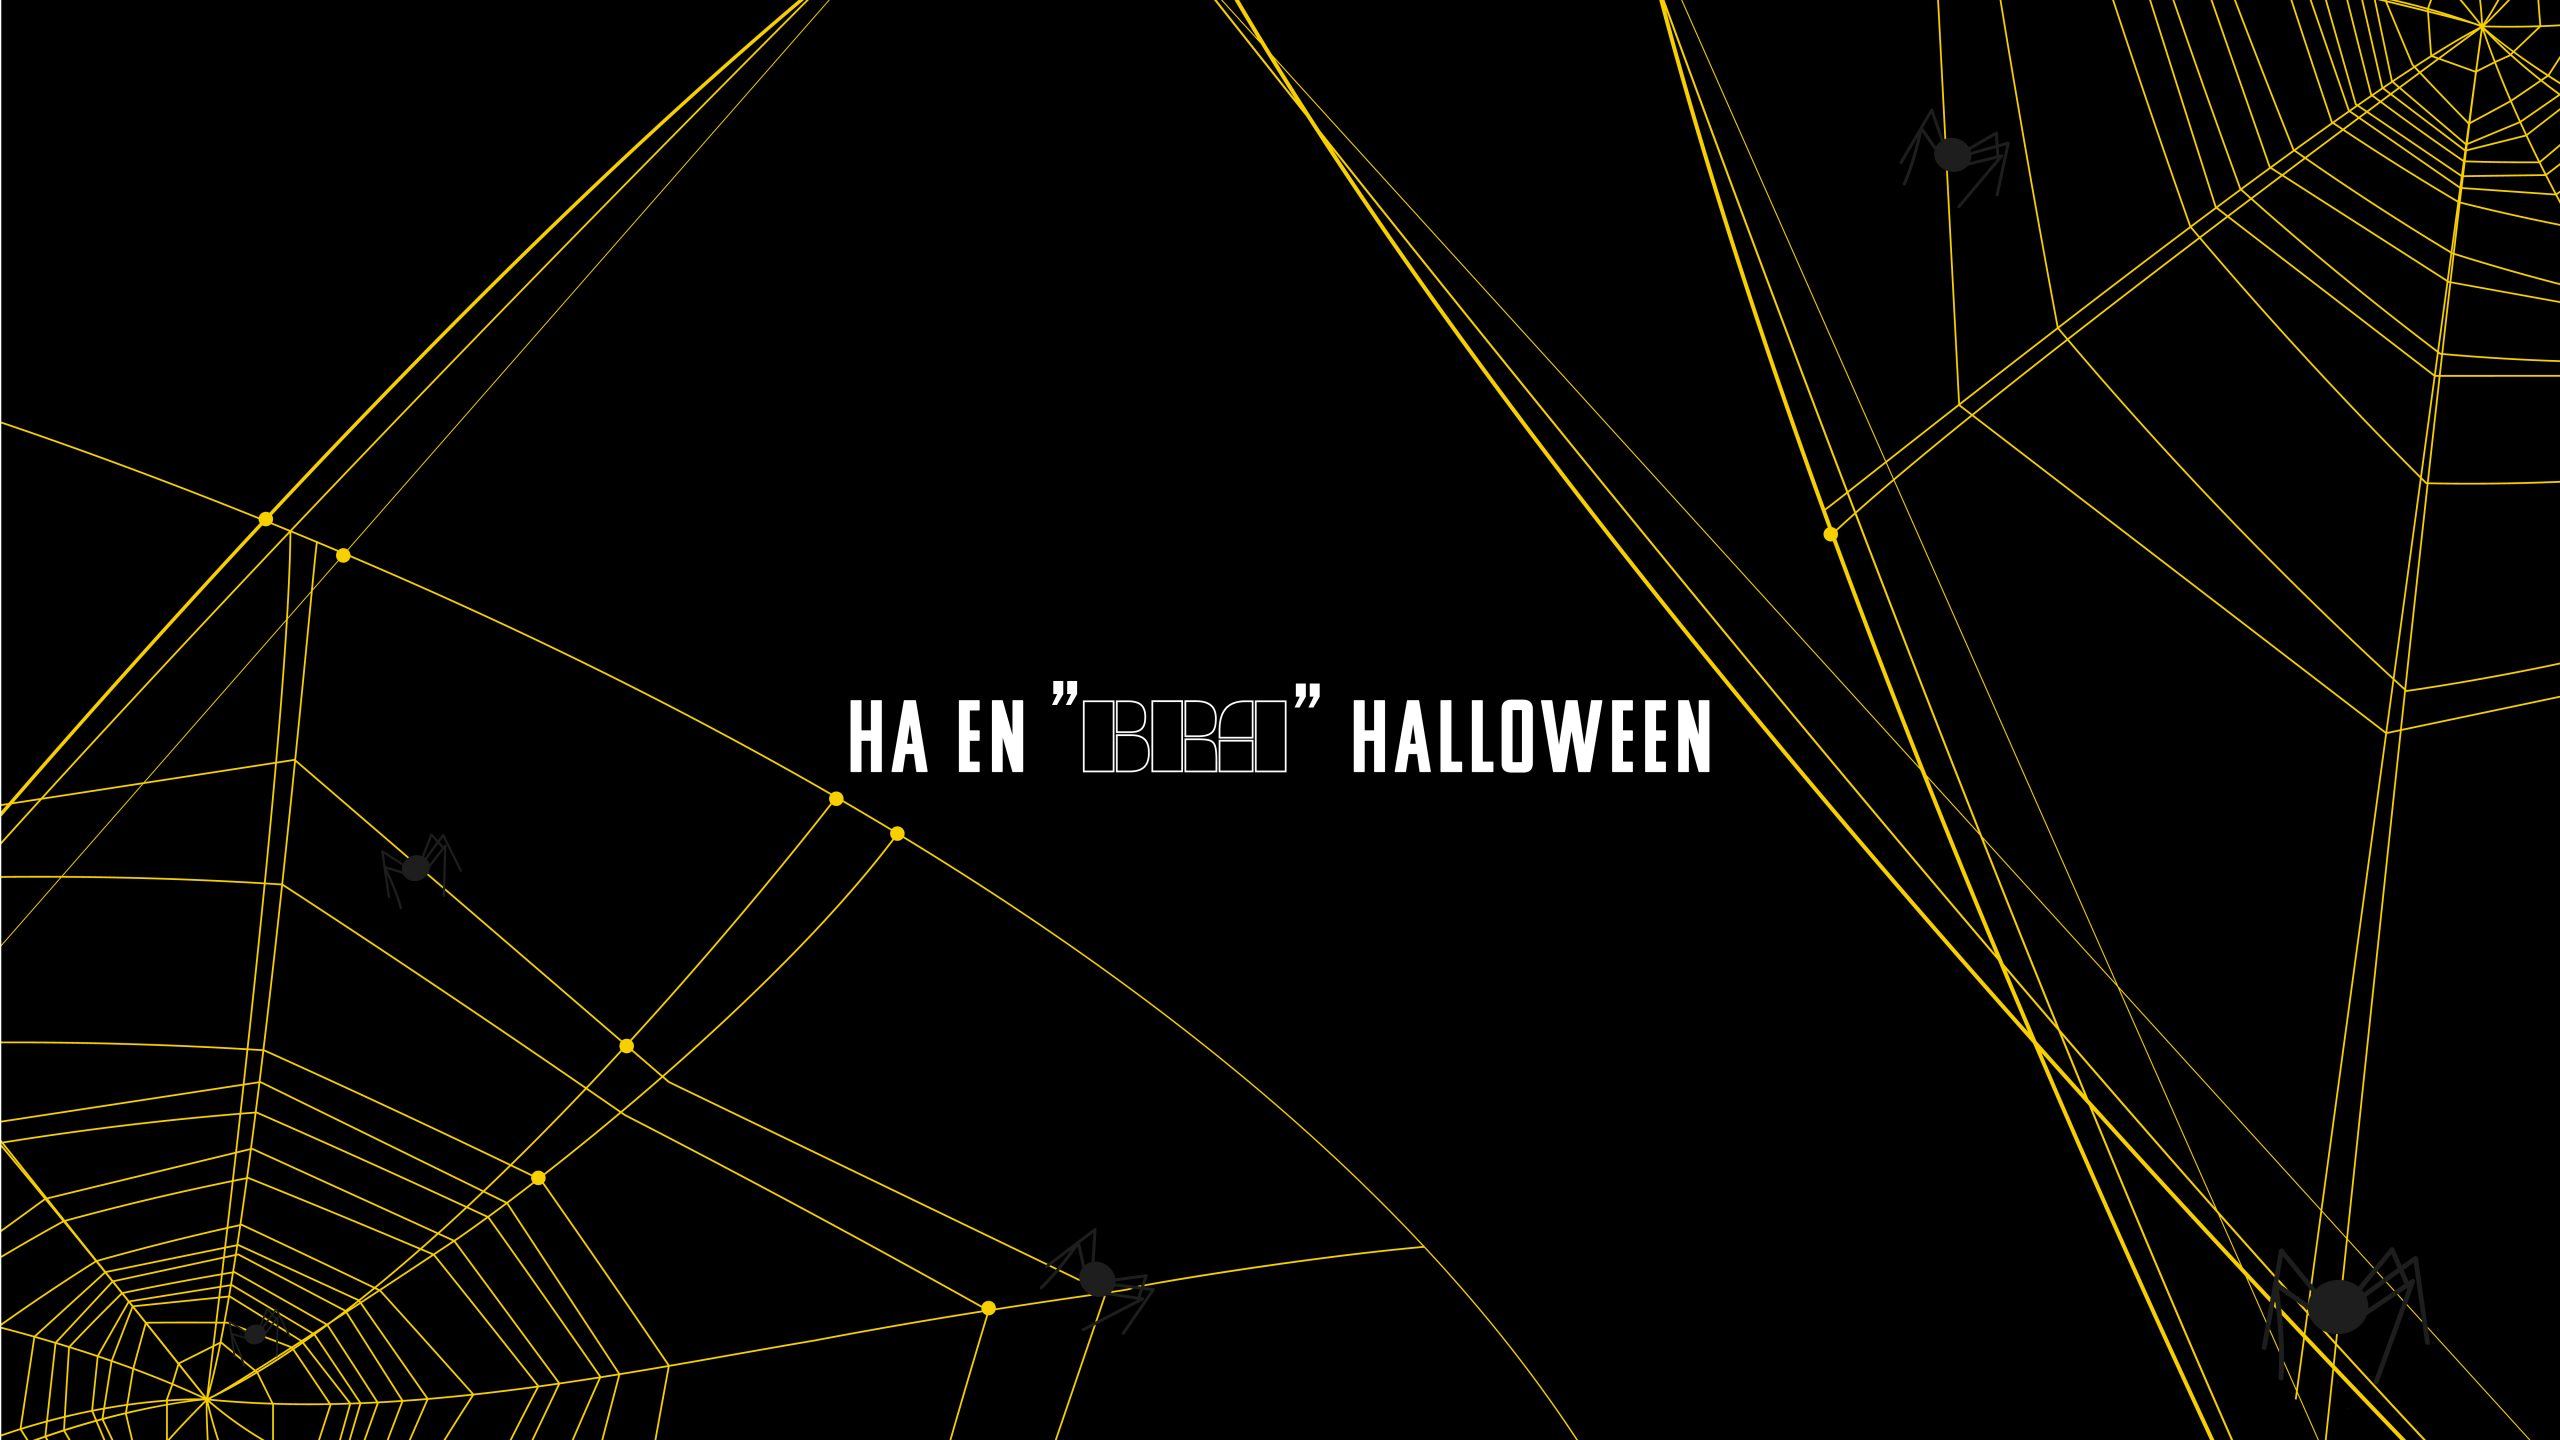 BRA_halloween2019-scaled.jpg